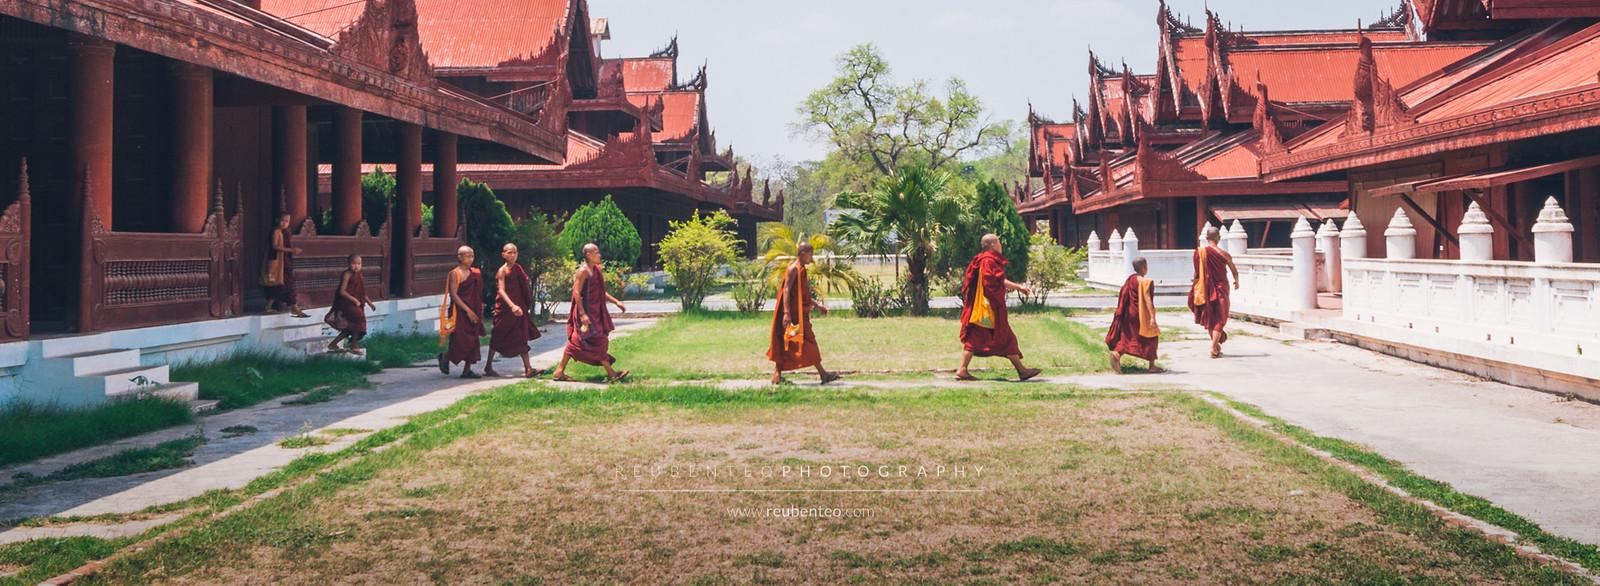 Abbey Road Monks, Mandalay